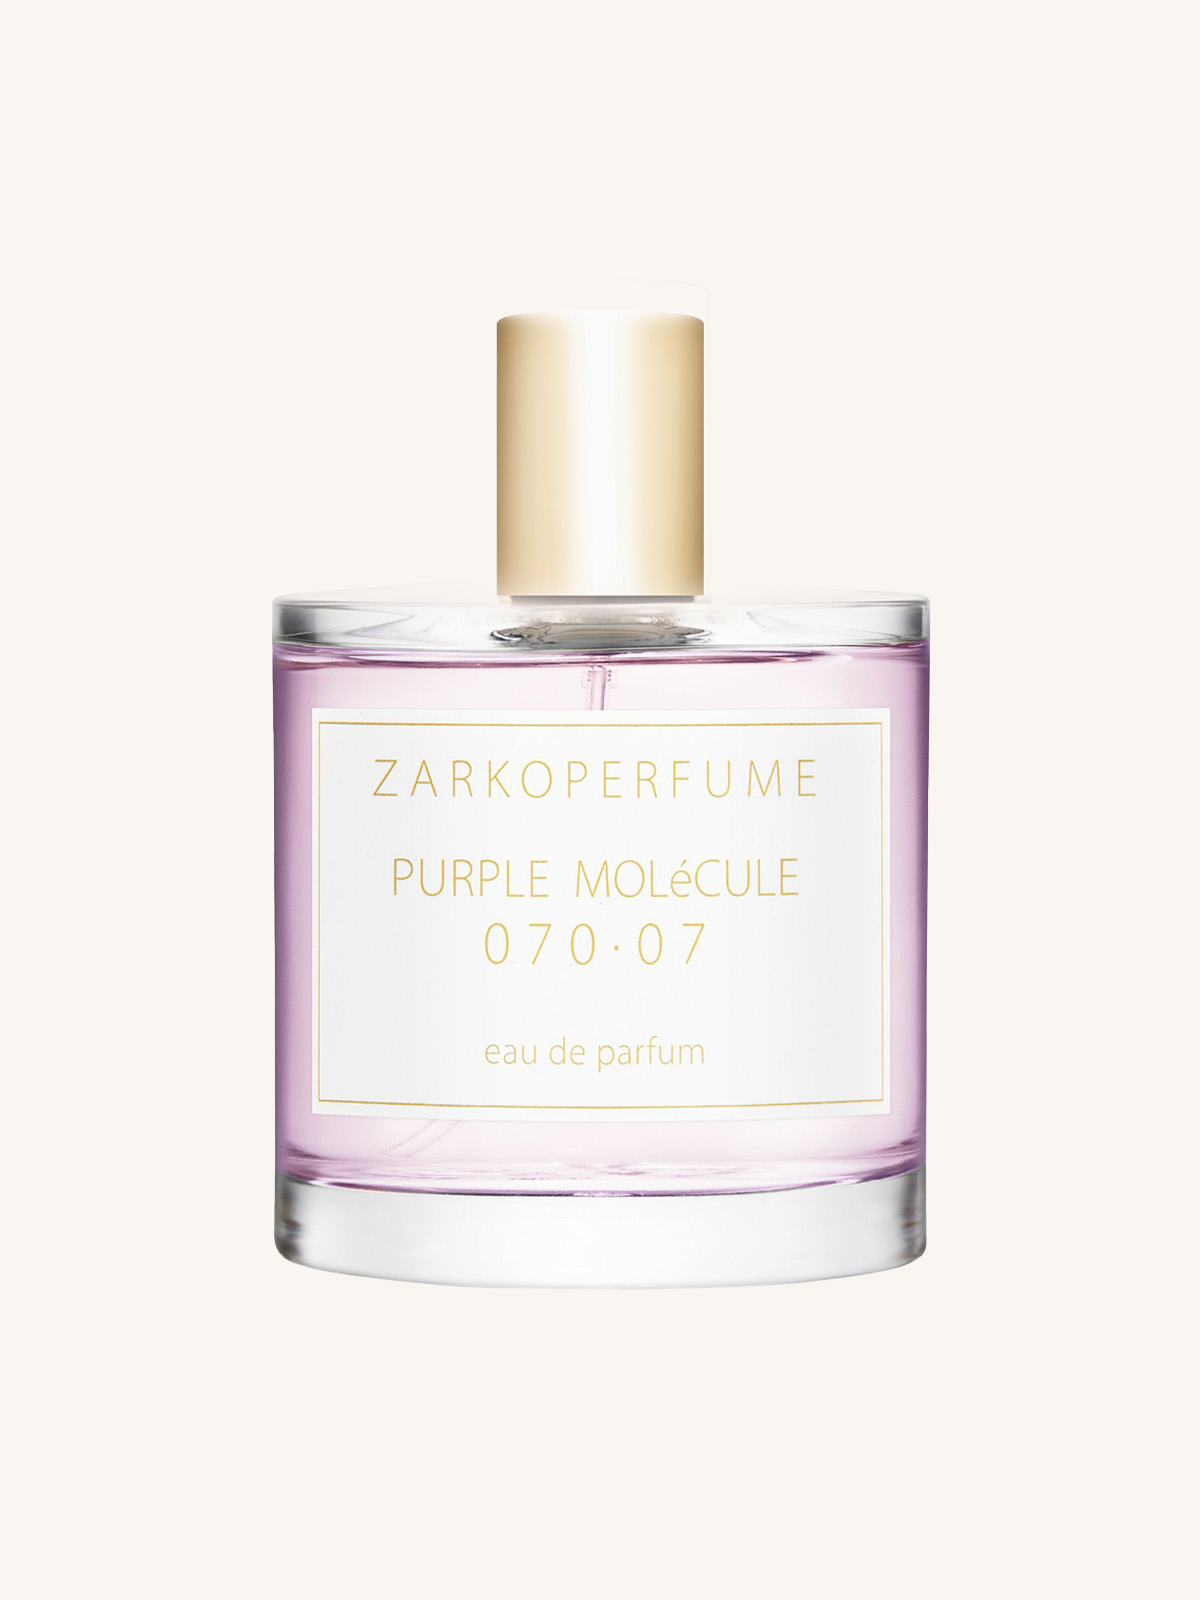 Zarkoperfume -  PURPLE MOLECULE